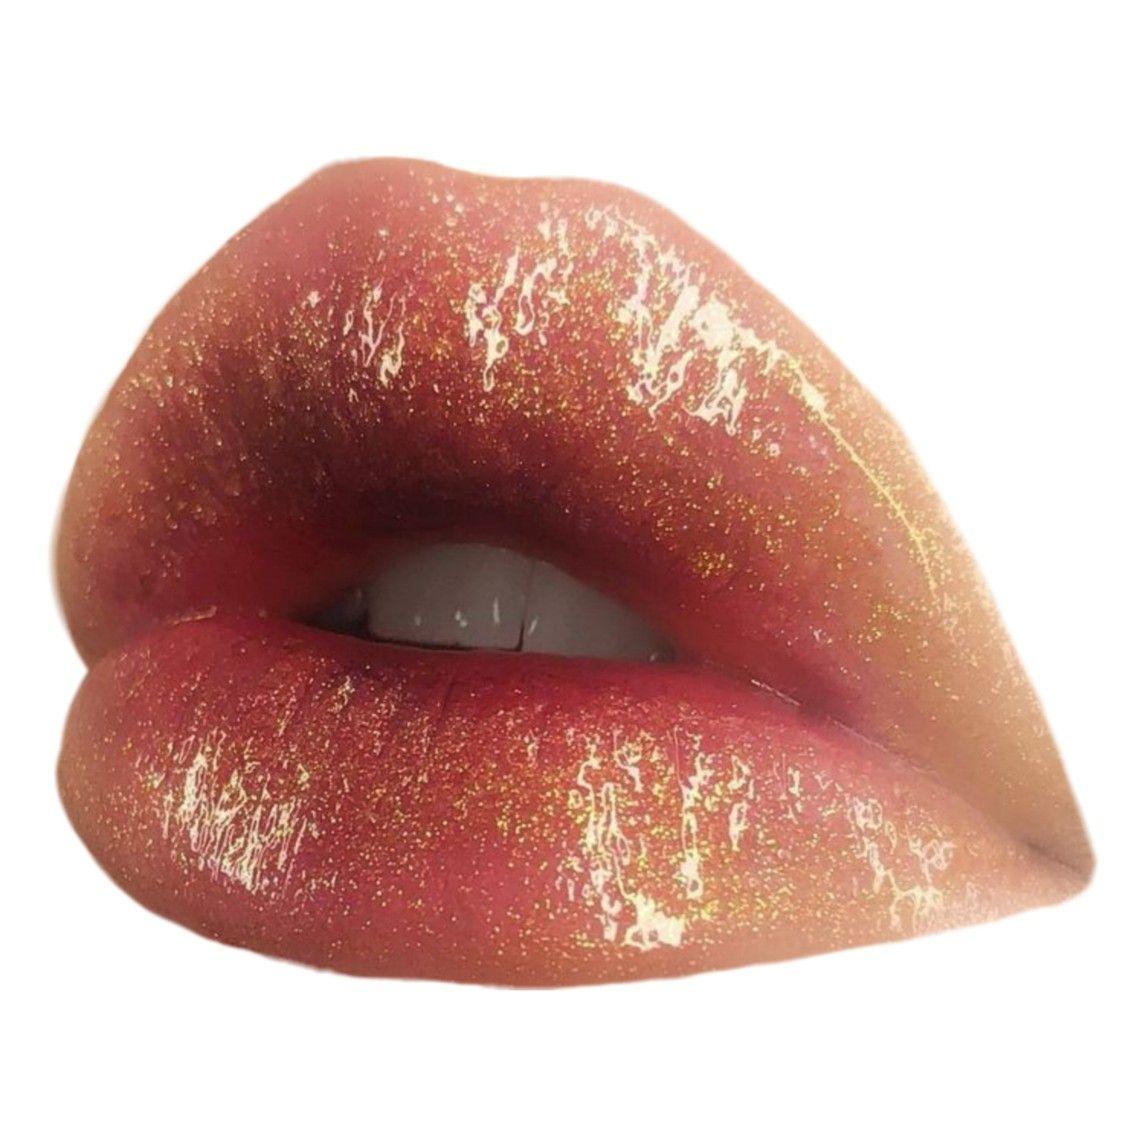 Lip Art Png Aesthetic Eyes Autumn Hair Accessories Edit My Photo